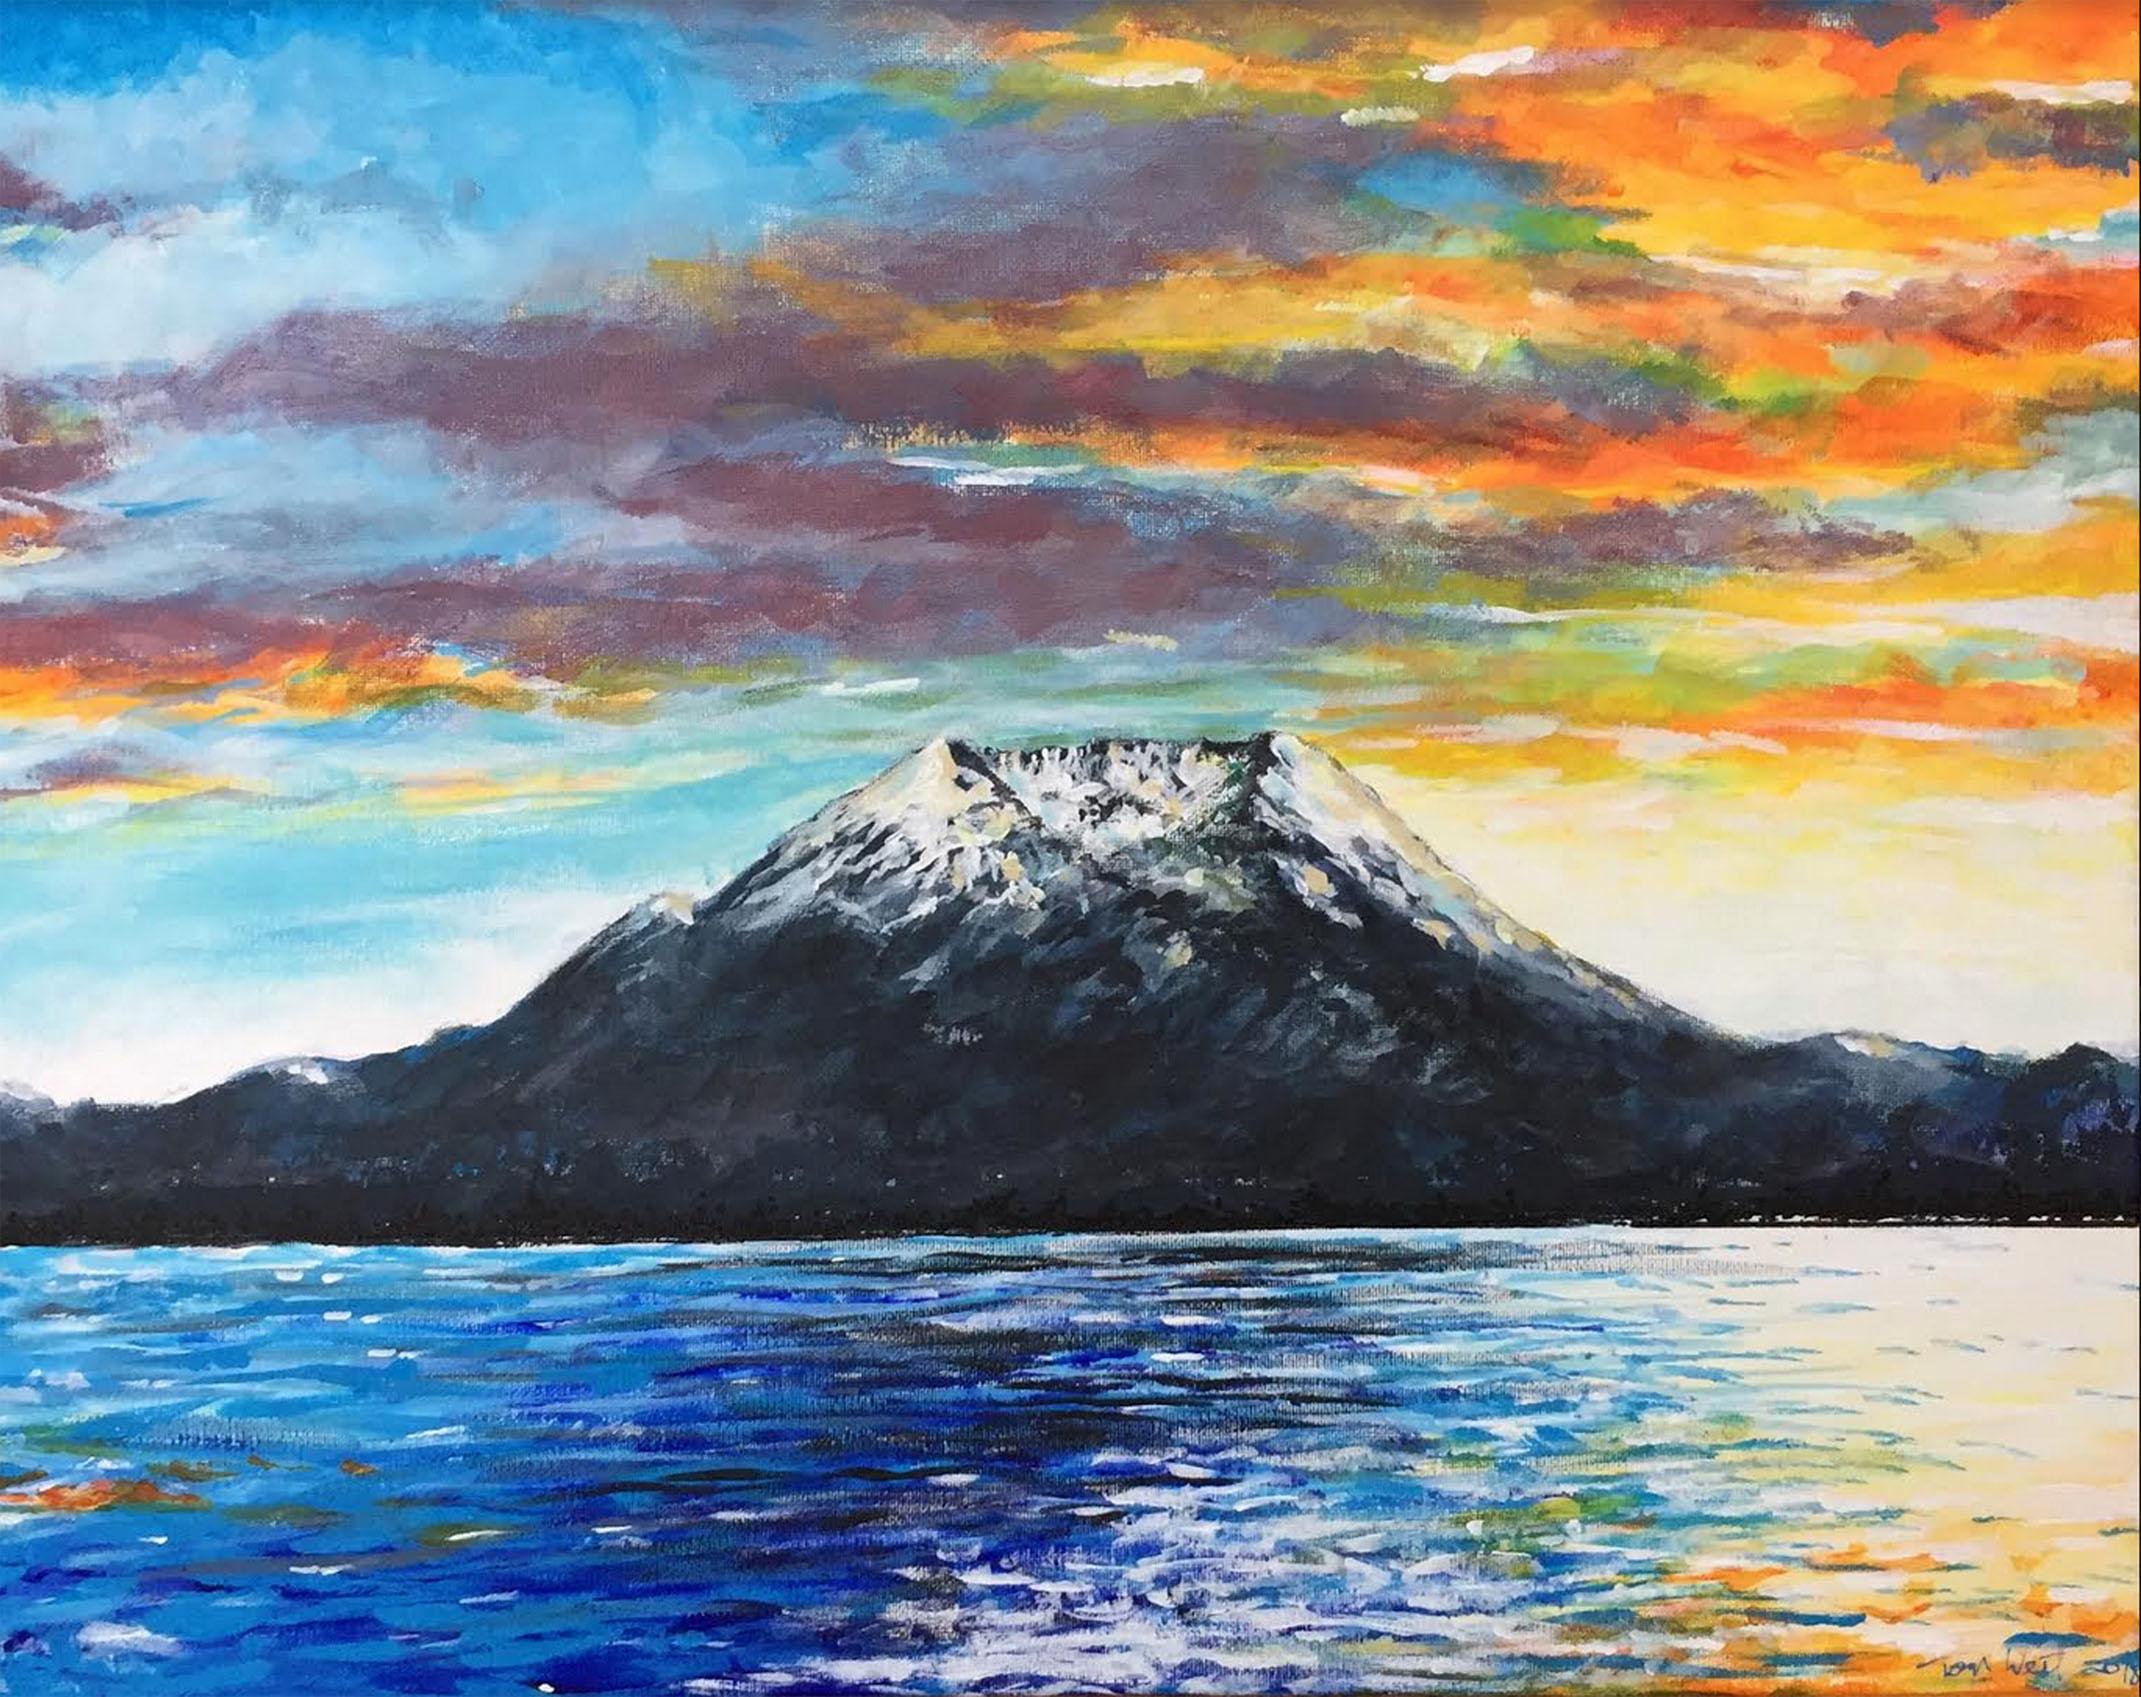 Mt. St. Helens twlight.jpg